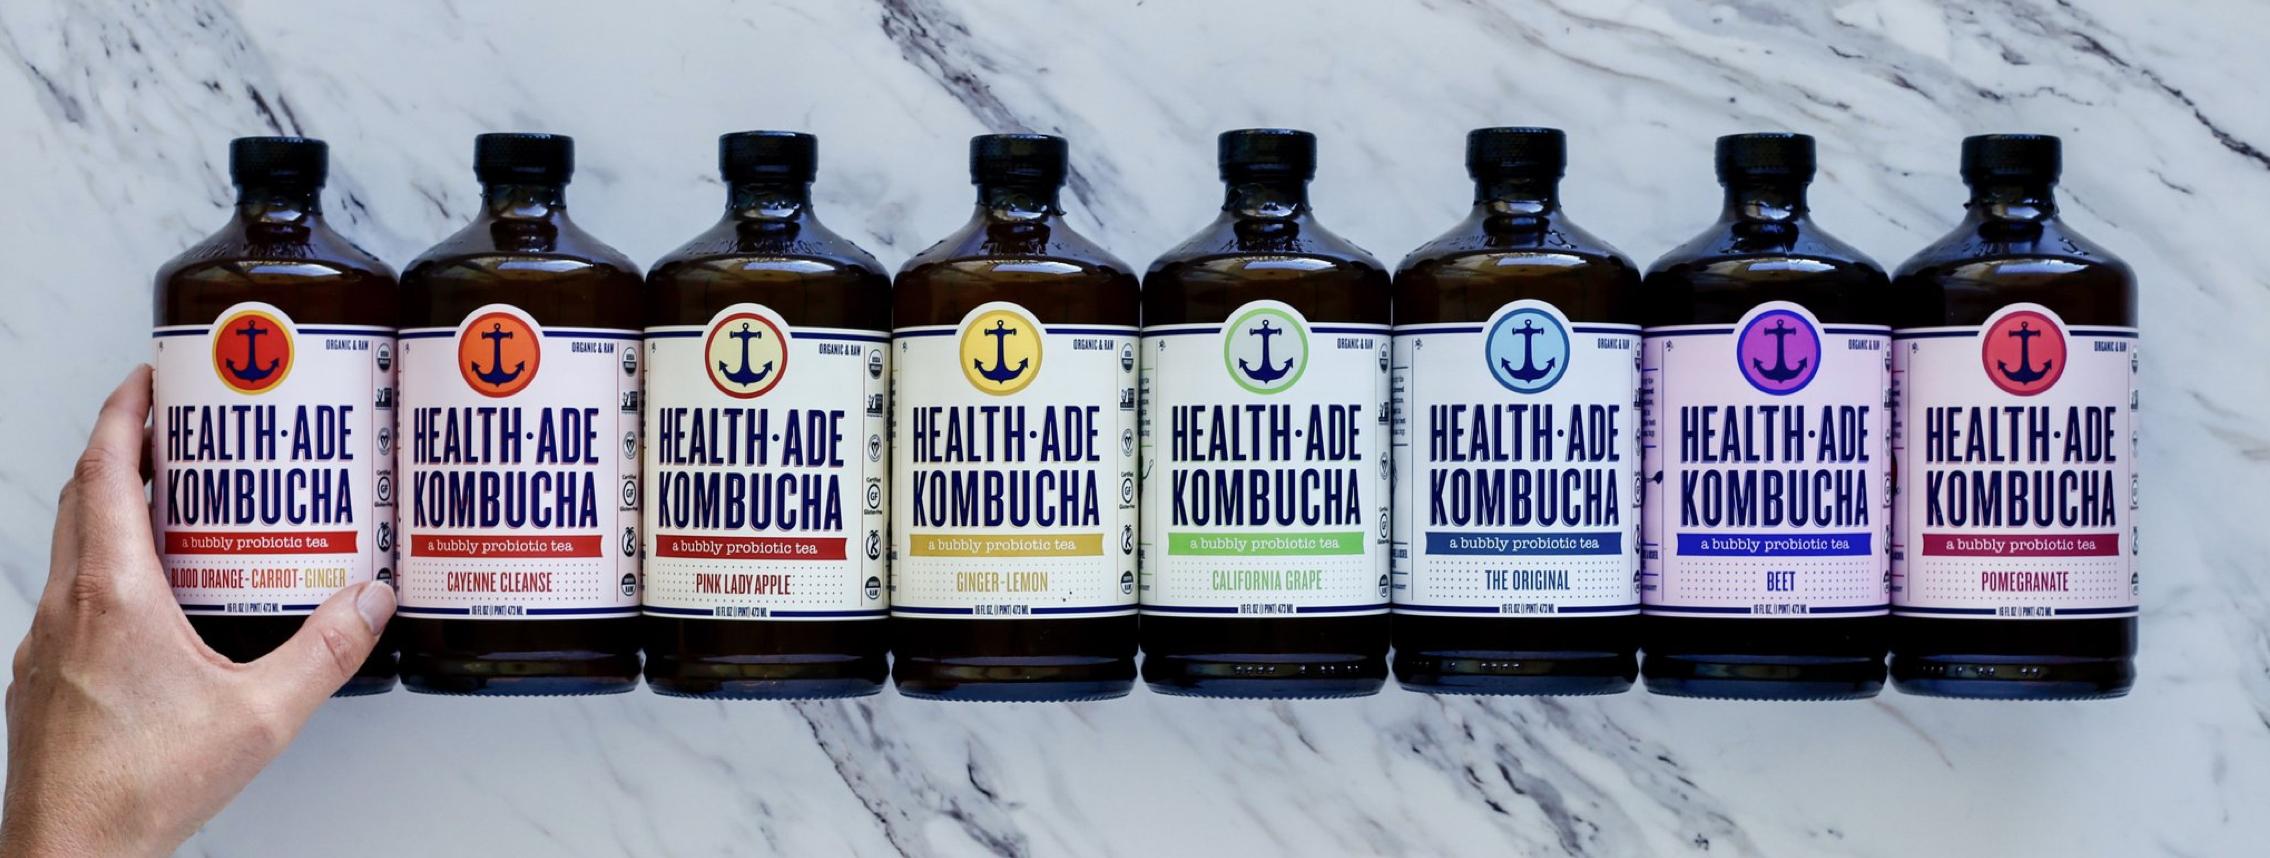 health+ade+kombucha, focus+on+local